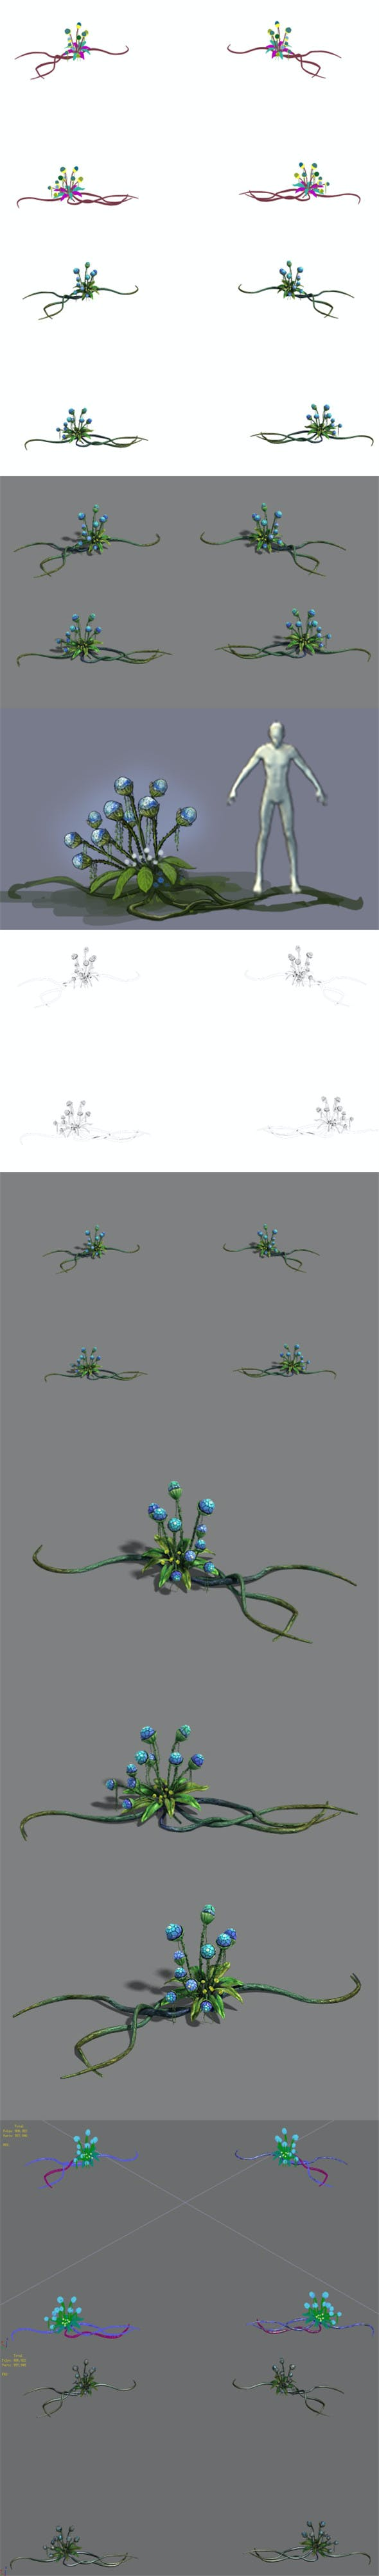 Strange - Flower 2 - 3DOcean Item for Sale